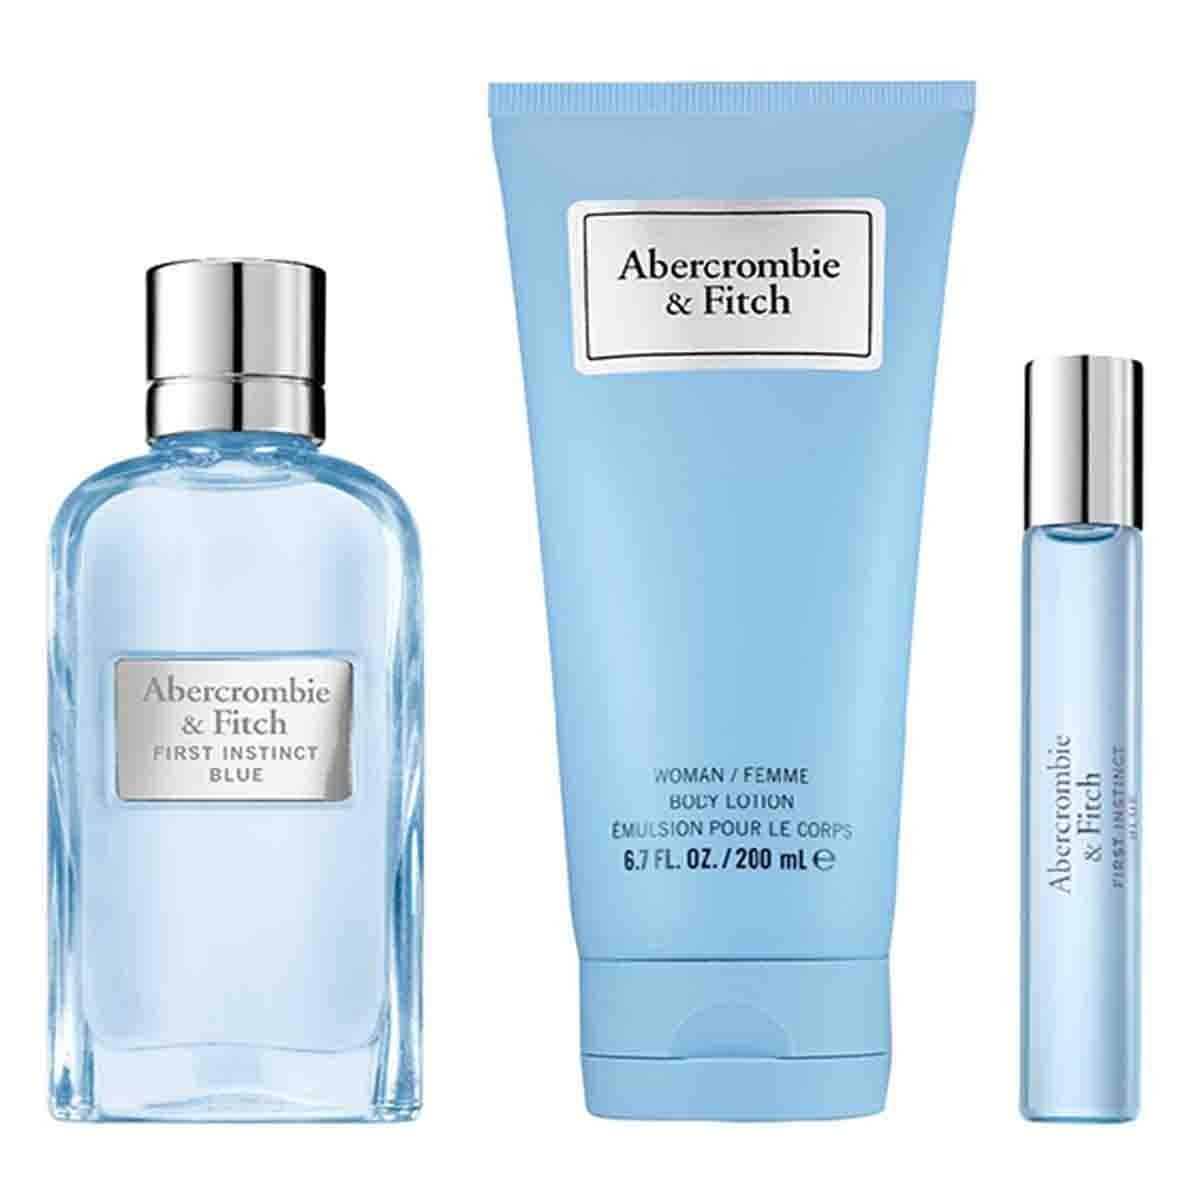 Estuche para Dama Abercrombie & Fitch First Instinct Blue Women Edp 100 Ml